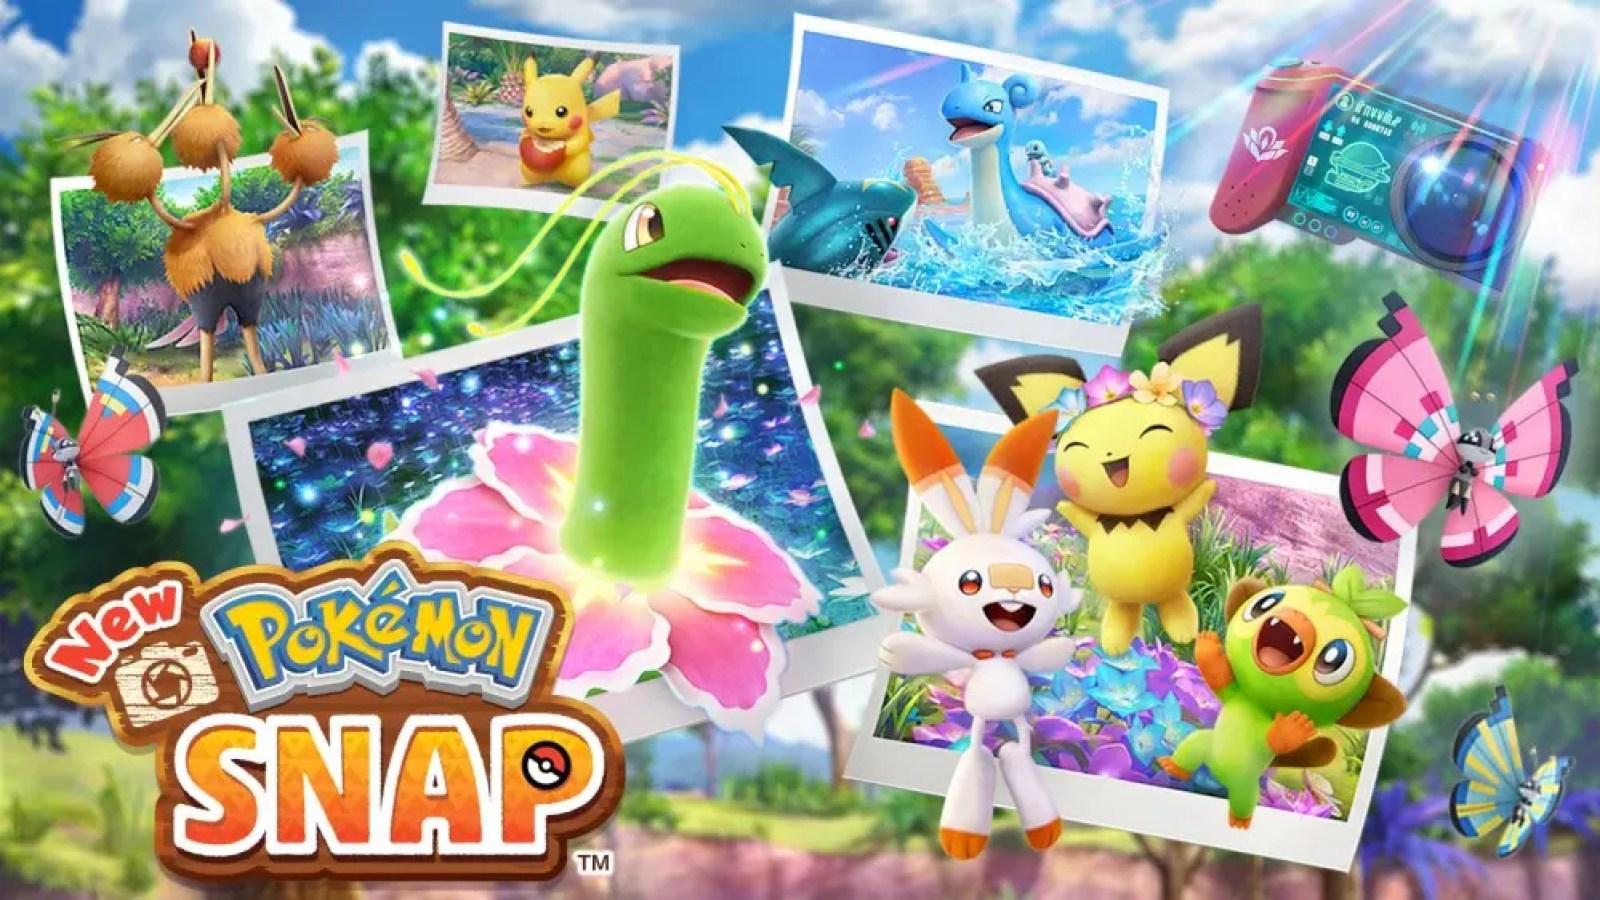 An illustration of 'New Pokemon Snap'